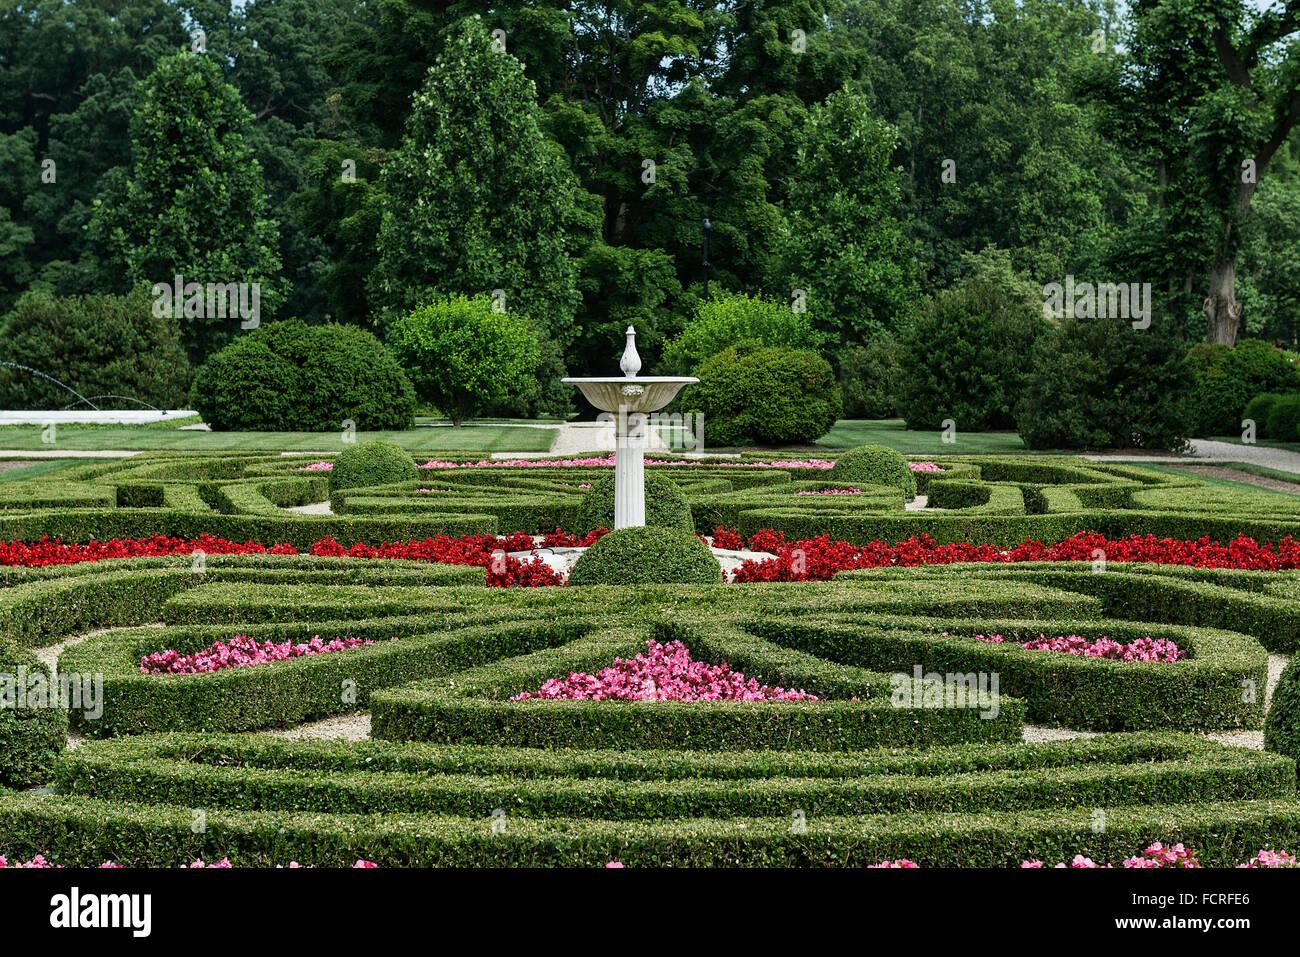 Boxwood Garden, Nemours Mansion and Gardens, Wilmington, Delaware, USA - Stock Image